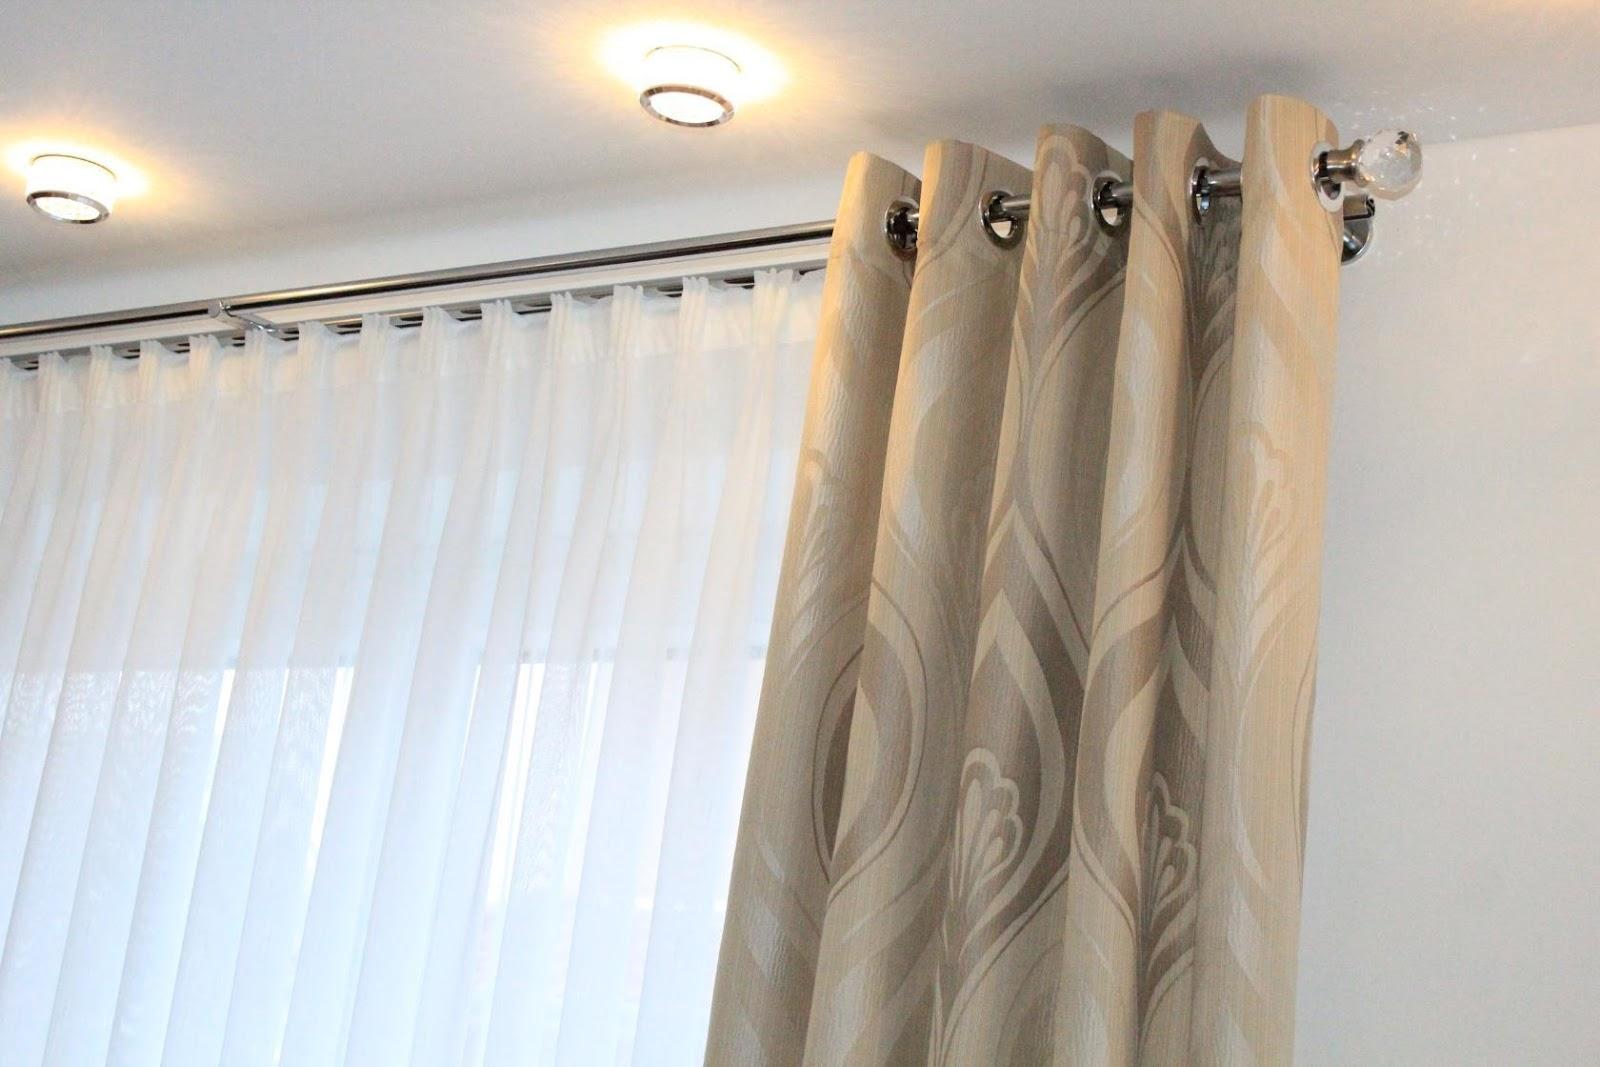 stange f r gardinen gardinen 2018. Black Bedroom Furniture Sets. Home Design Ideas